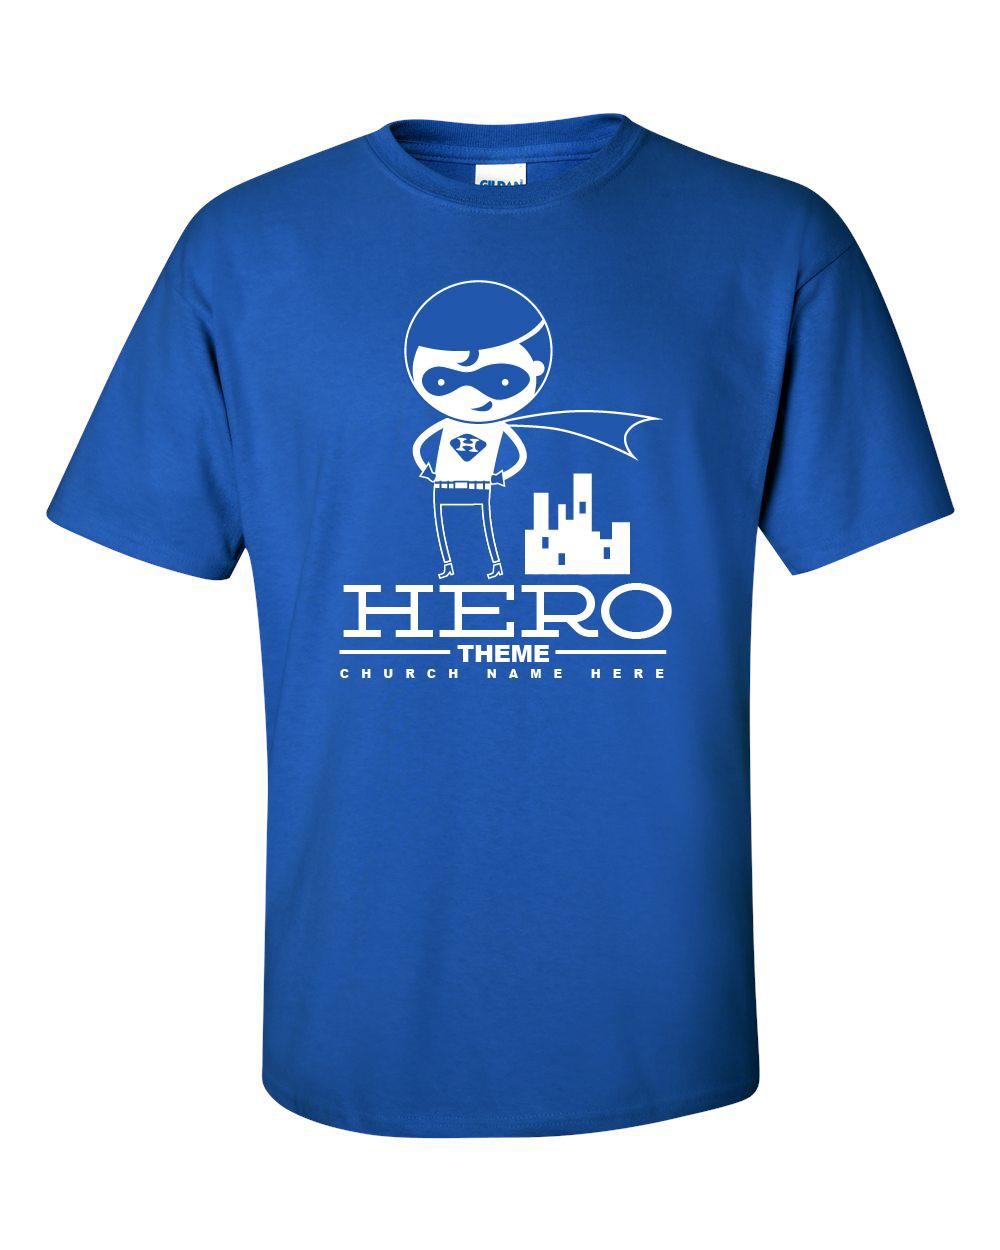 Hero 1-02.jpg